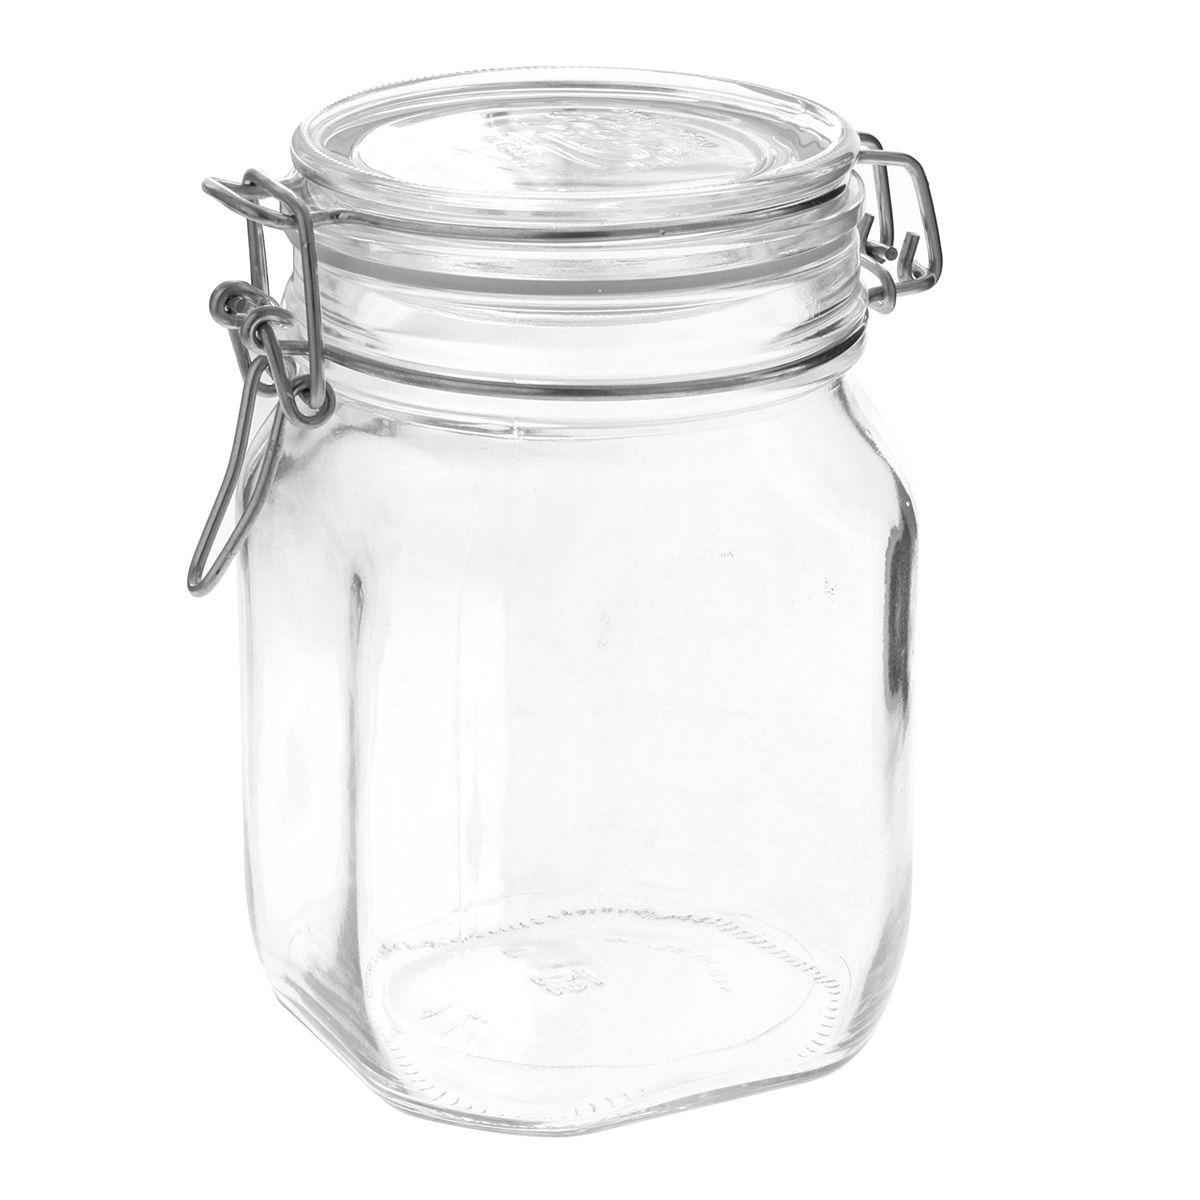 Bocal de conservation hermétique en verre Fido 1L - Bormioli